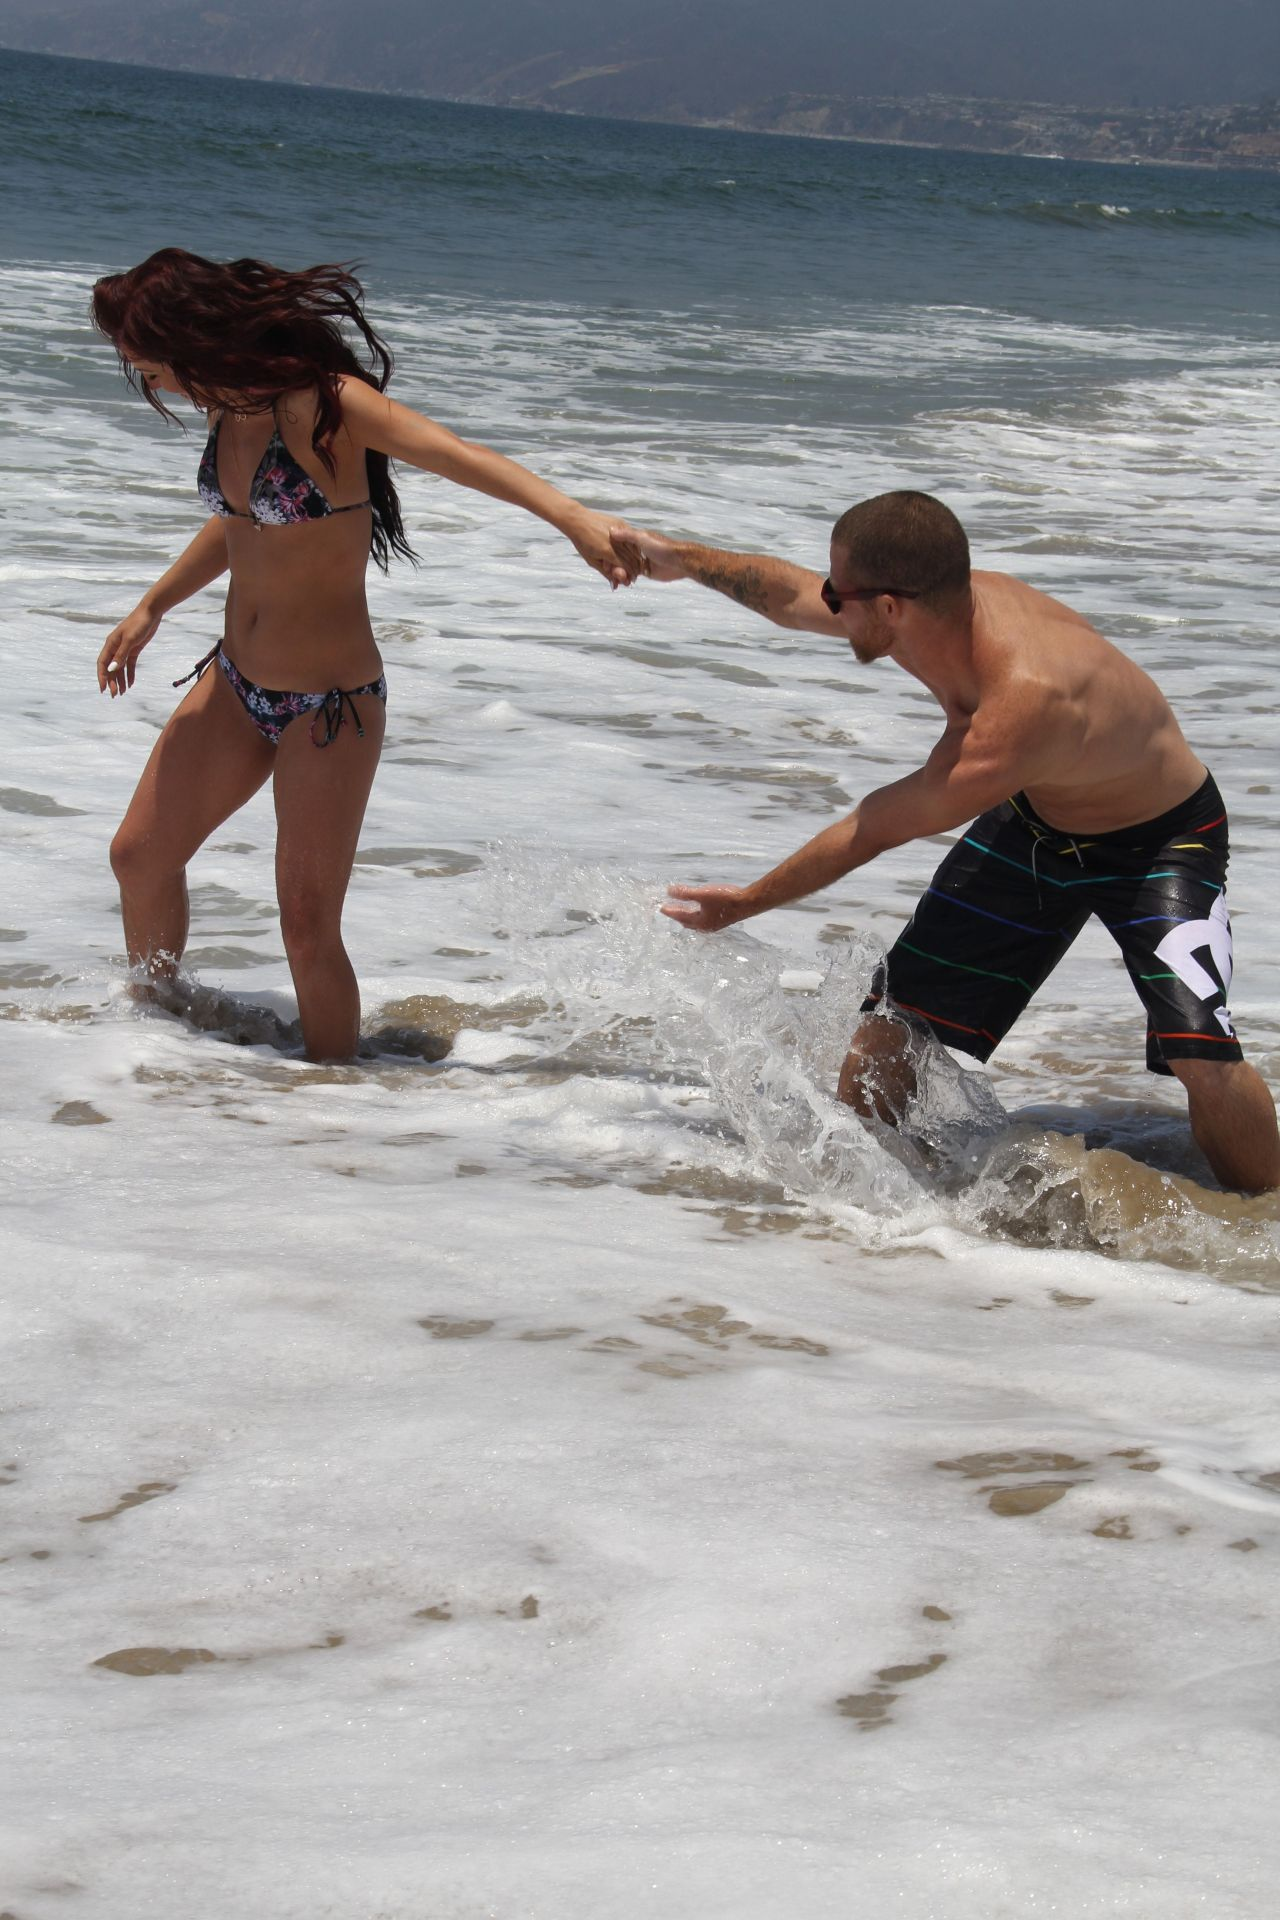 Sharna Burgess In A Bikini On The Beach In Malibu June 2014